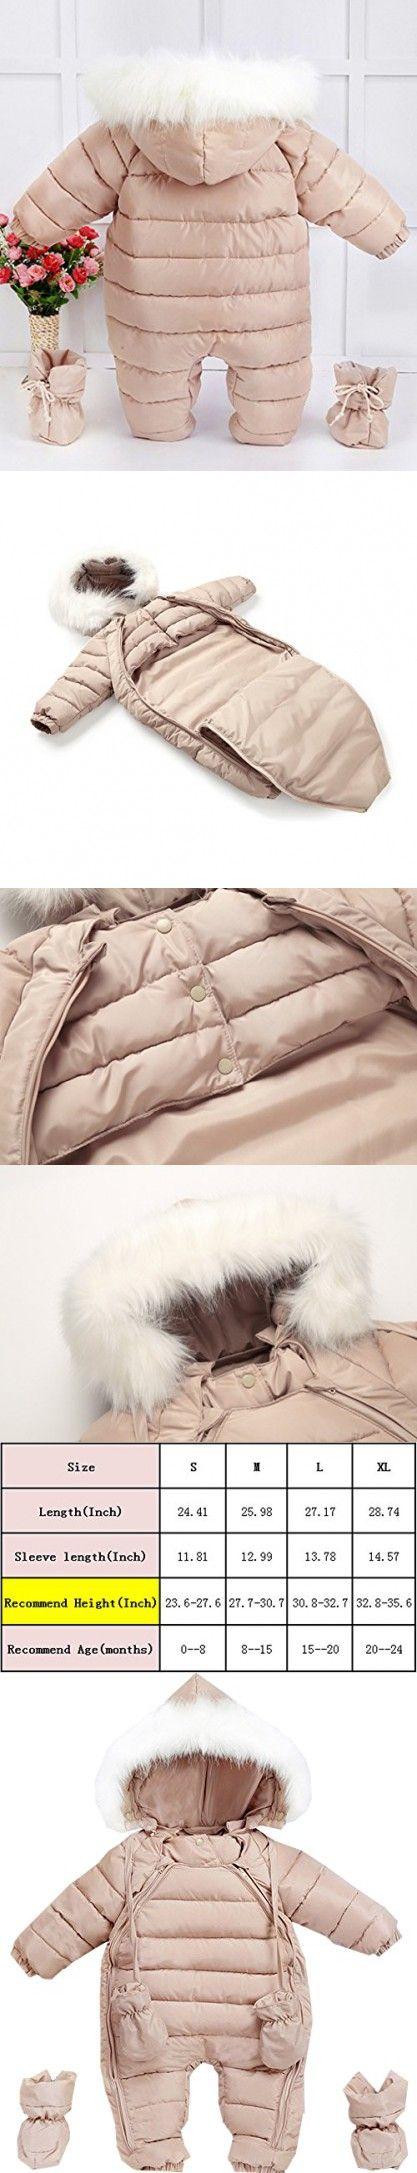 GIRL MELODY Fashion Baby Romper Baby Dress Winter Coat Cute Baby Snowsuit for Newborn Baby(Small, Khaki)